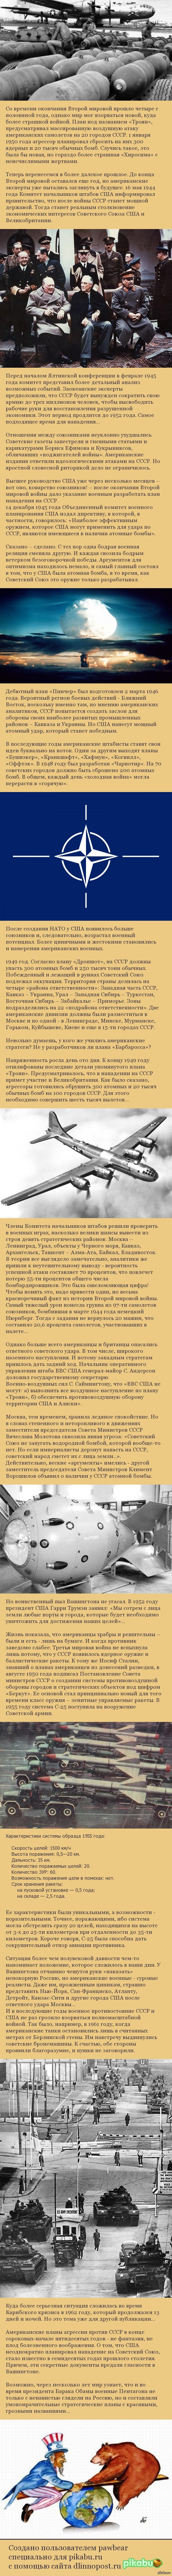 План «Троян»: 300 атомных бомб на СССР